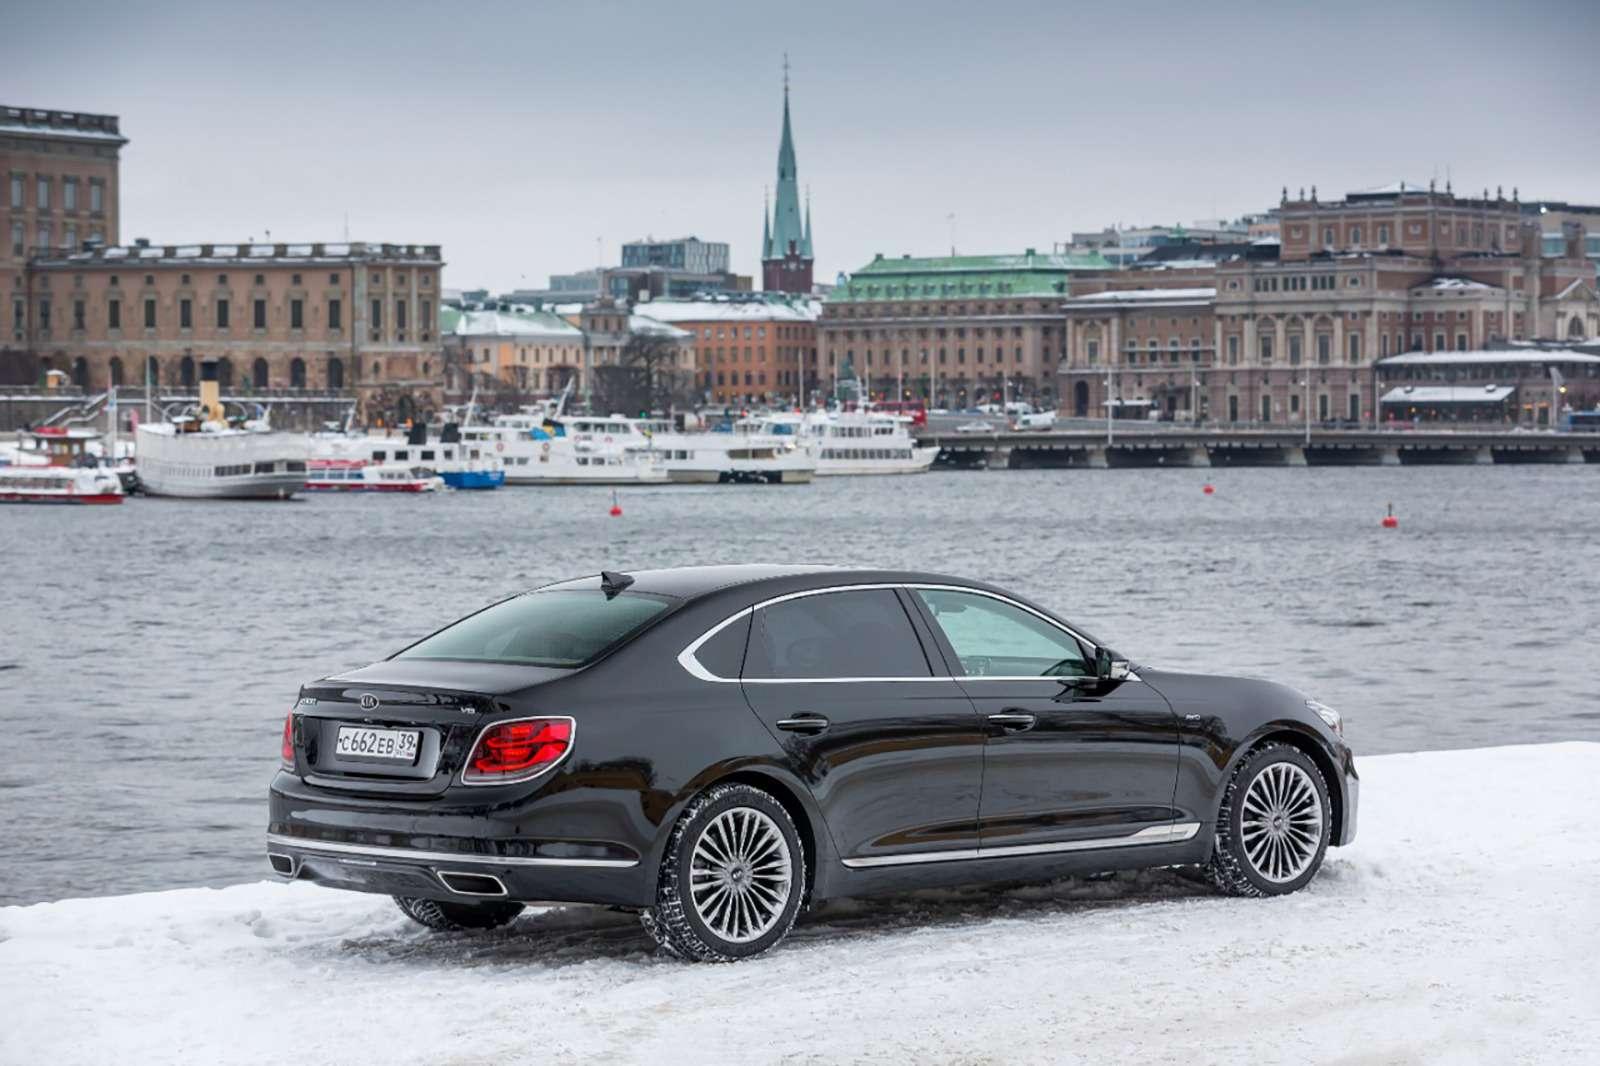 Kiaназвала российские цены нафлагманский седан K900— фото 946136